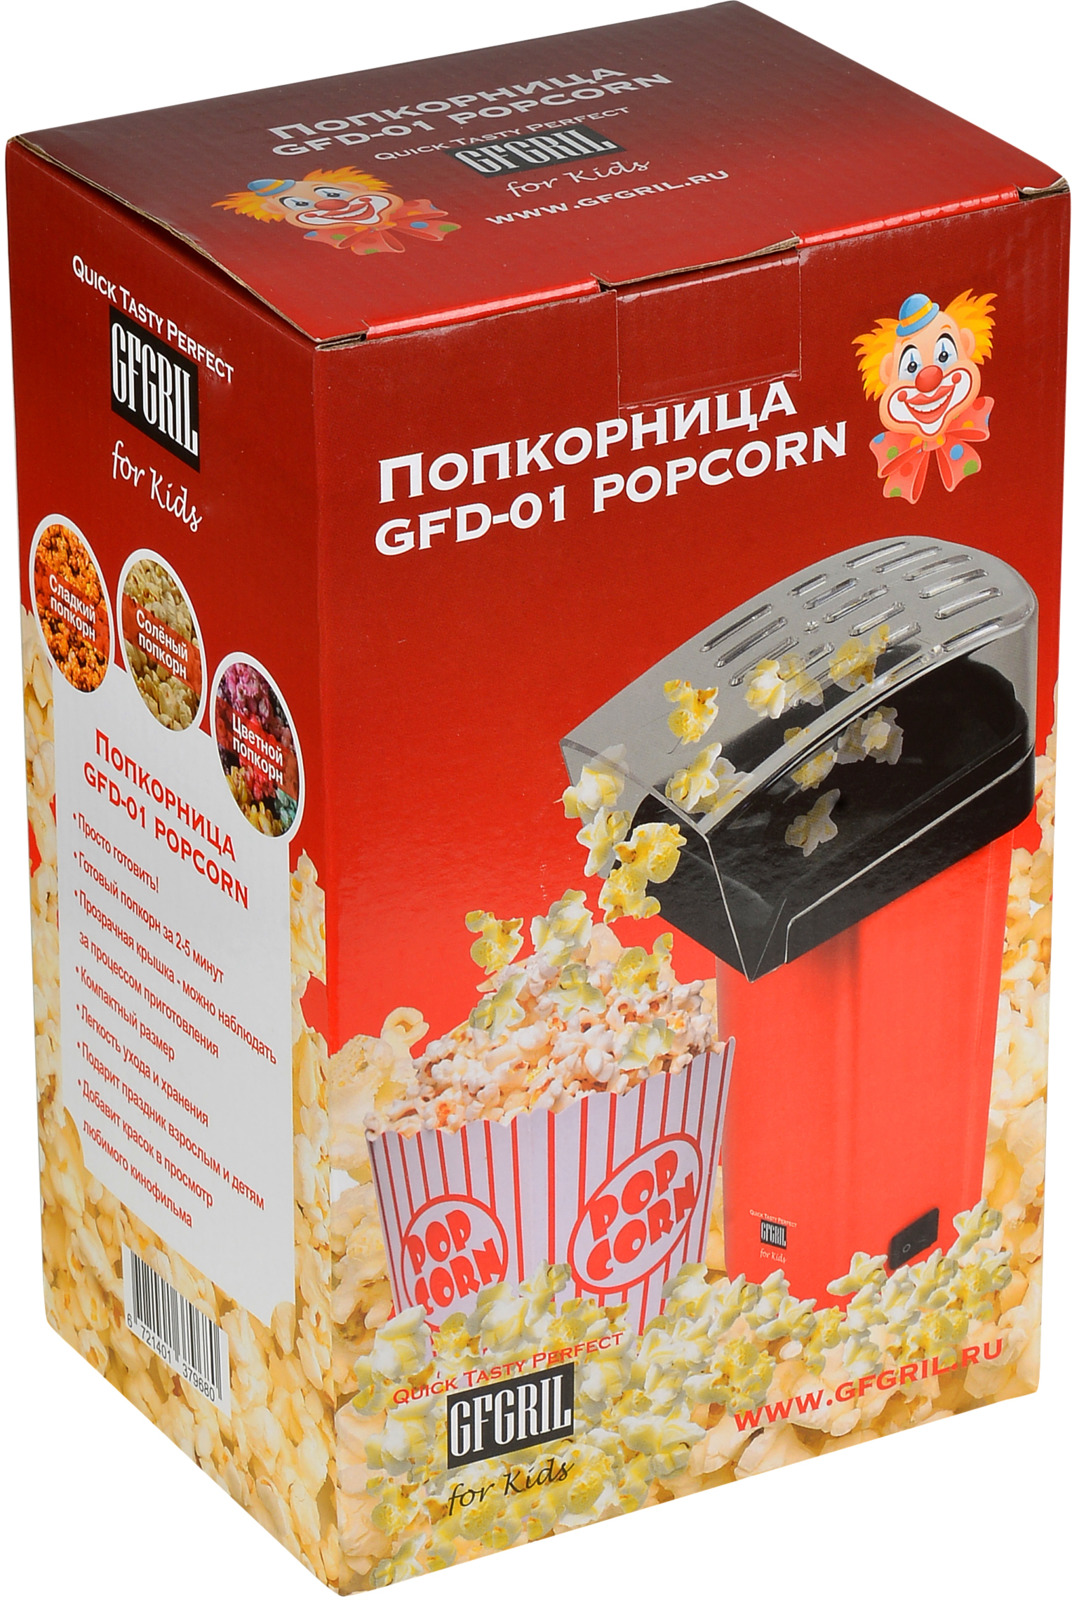 Попкорн мейкер GFgril, GFD-01, red GFgril